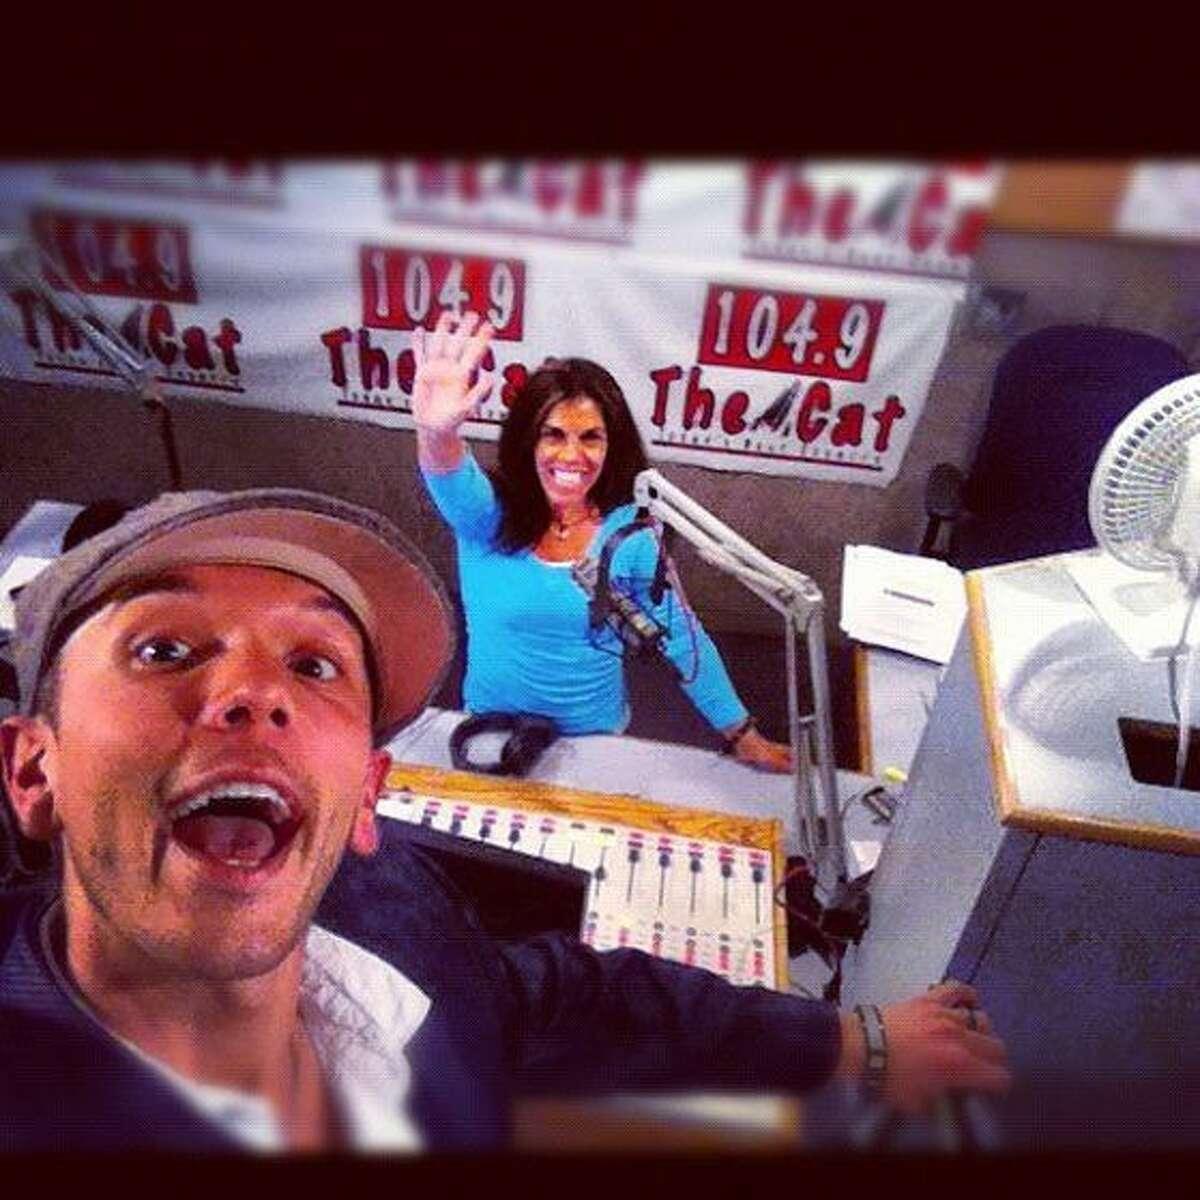 3. Jake & Dana, 100.9 FM The Cat.